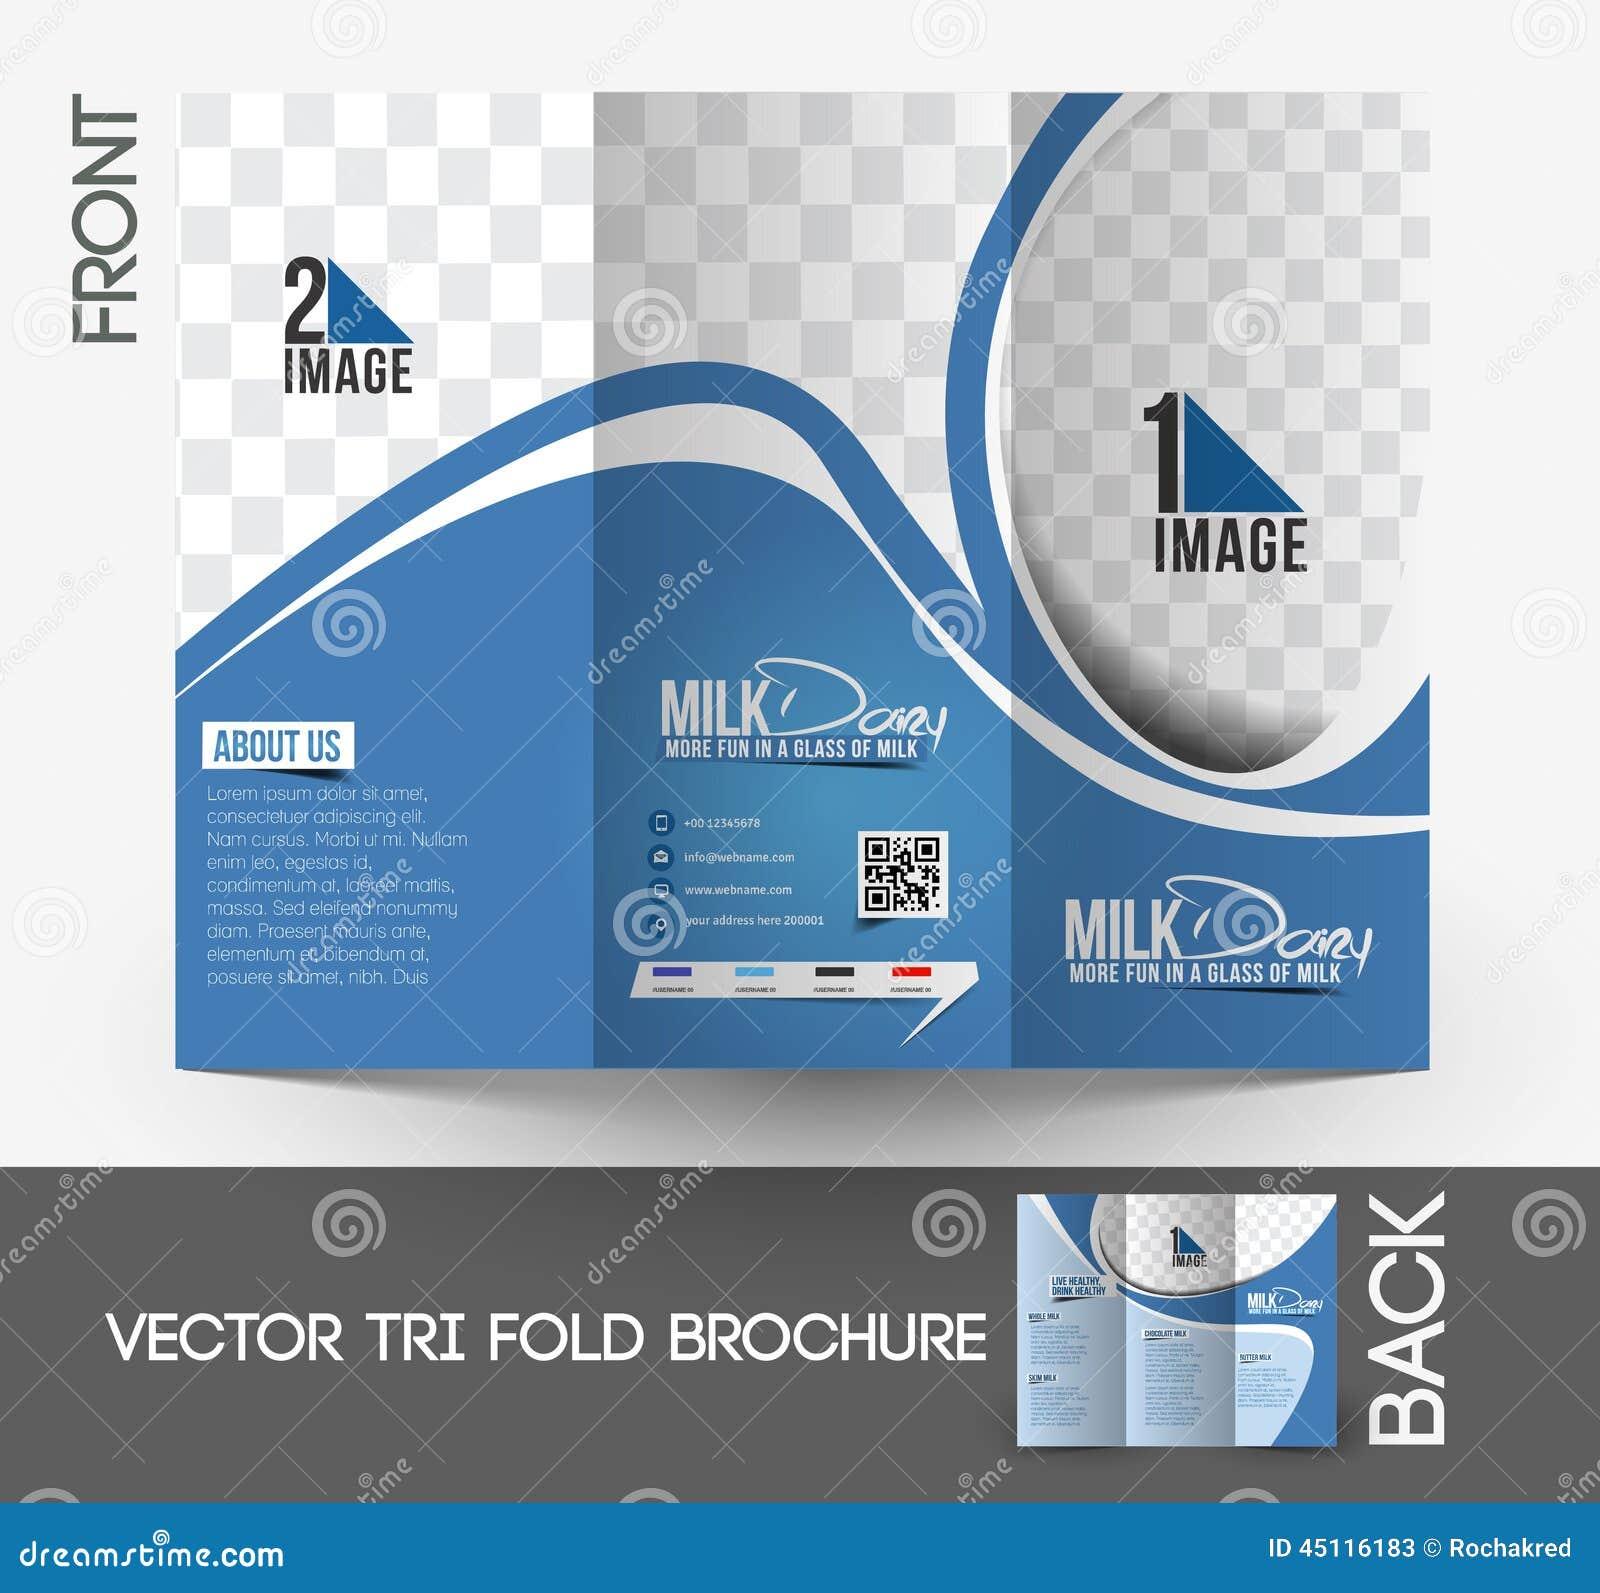 Product Tri Fold Brochure: Milk Store Tri-Fold Brochure Stock Vector